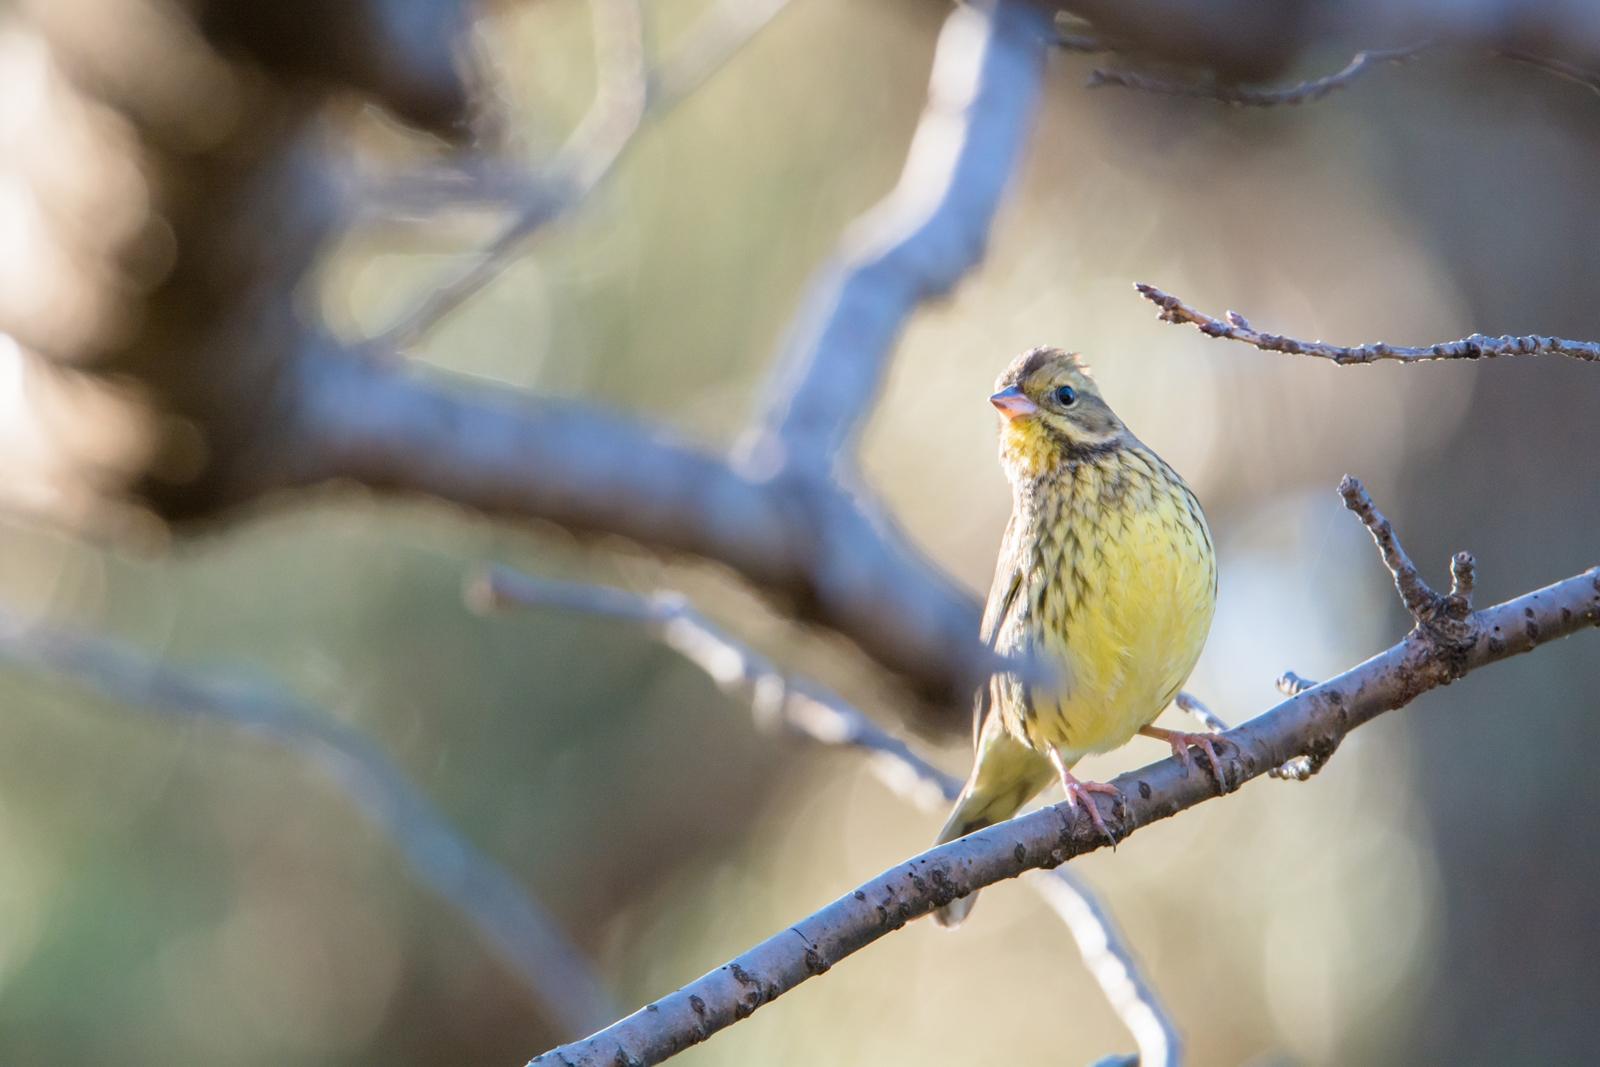 Photo: 光りの射す森 Light shines forest  冬の森 遮るものが無くなり 光りは奥深くへと 物静かな住人が 活き活きと動き出す  Black-faced bunting. (アオジ) #cooljapan #365cooljapanmay #birdphotography #birds #kawaii Nikon D7100 SIGMA 150-600mm F5-6.3 DG OS HSM Sports [ Day242, January 9th ] (2枚追加:Added 2 photo)